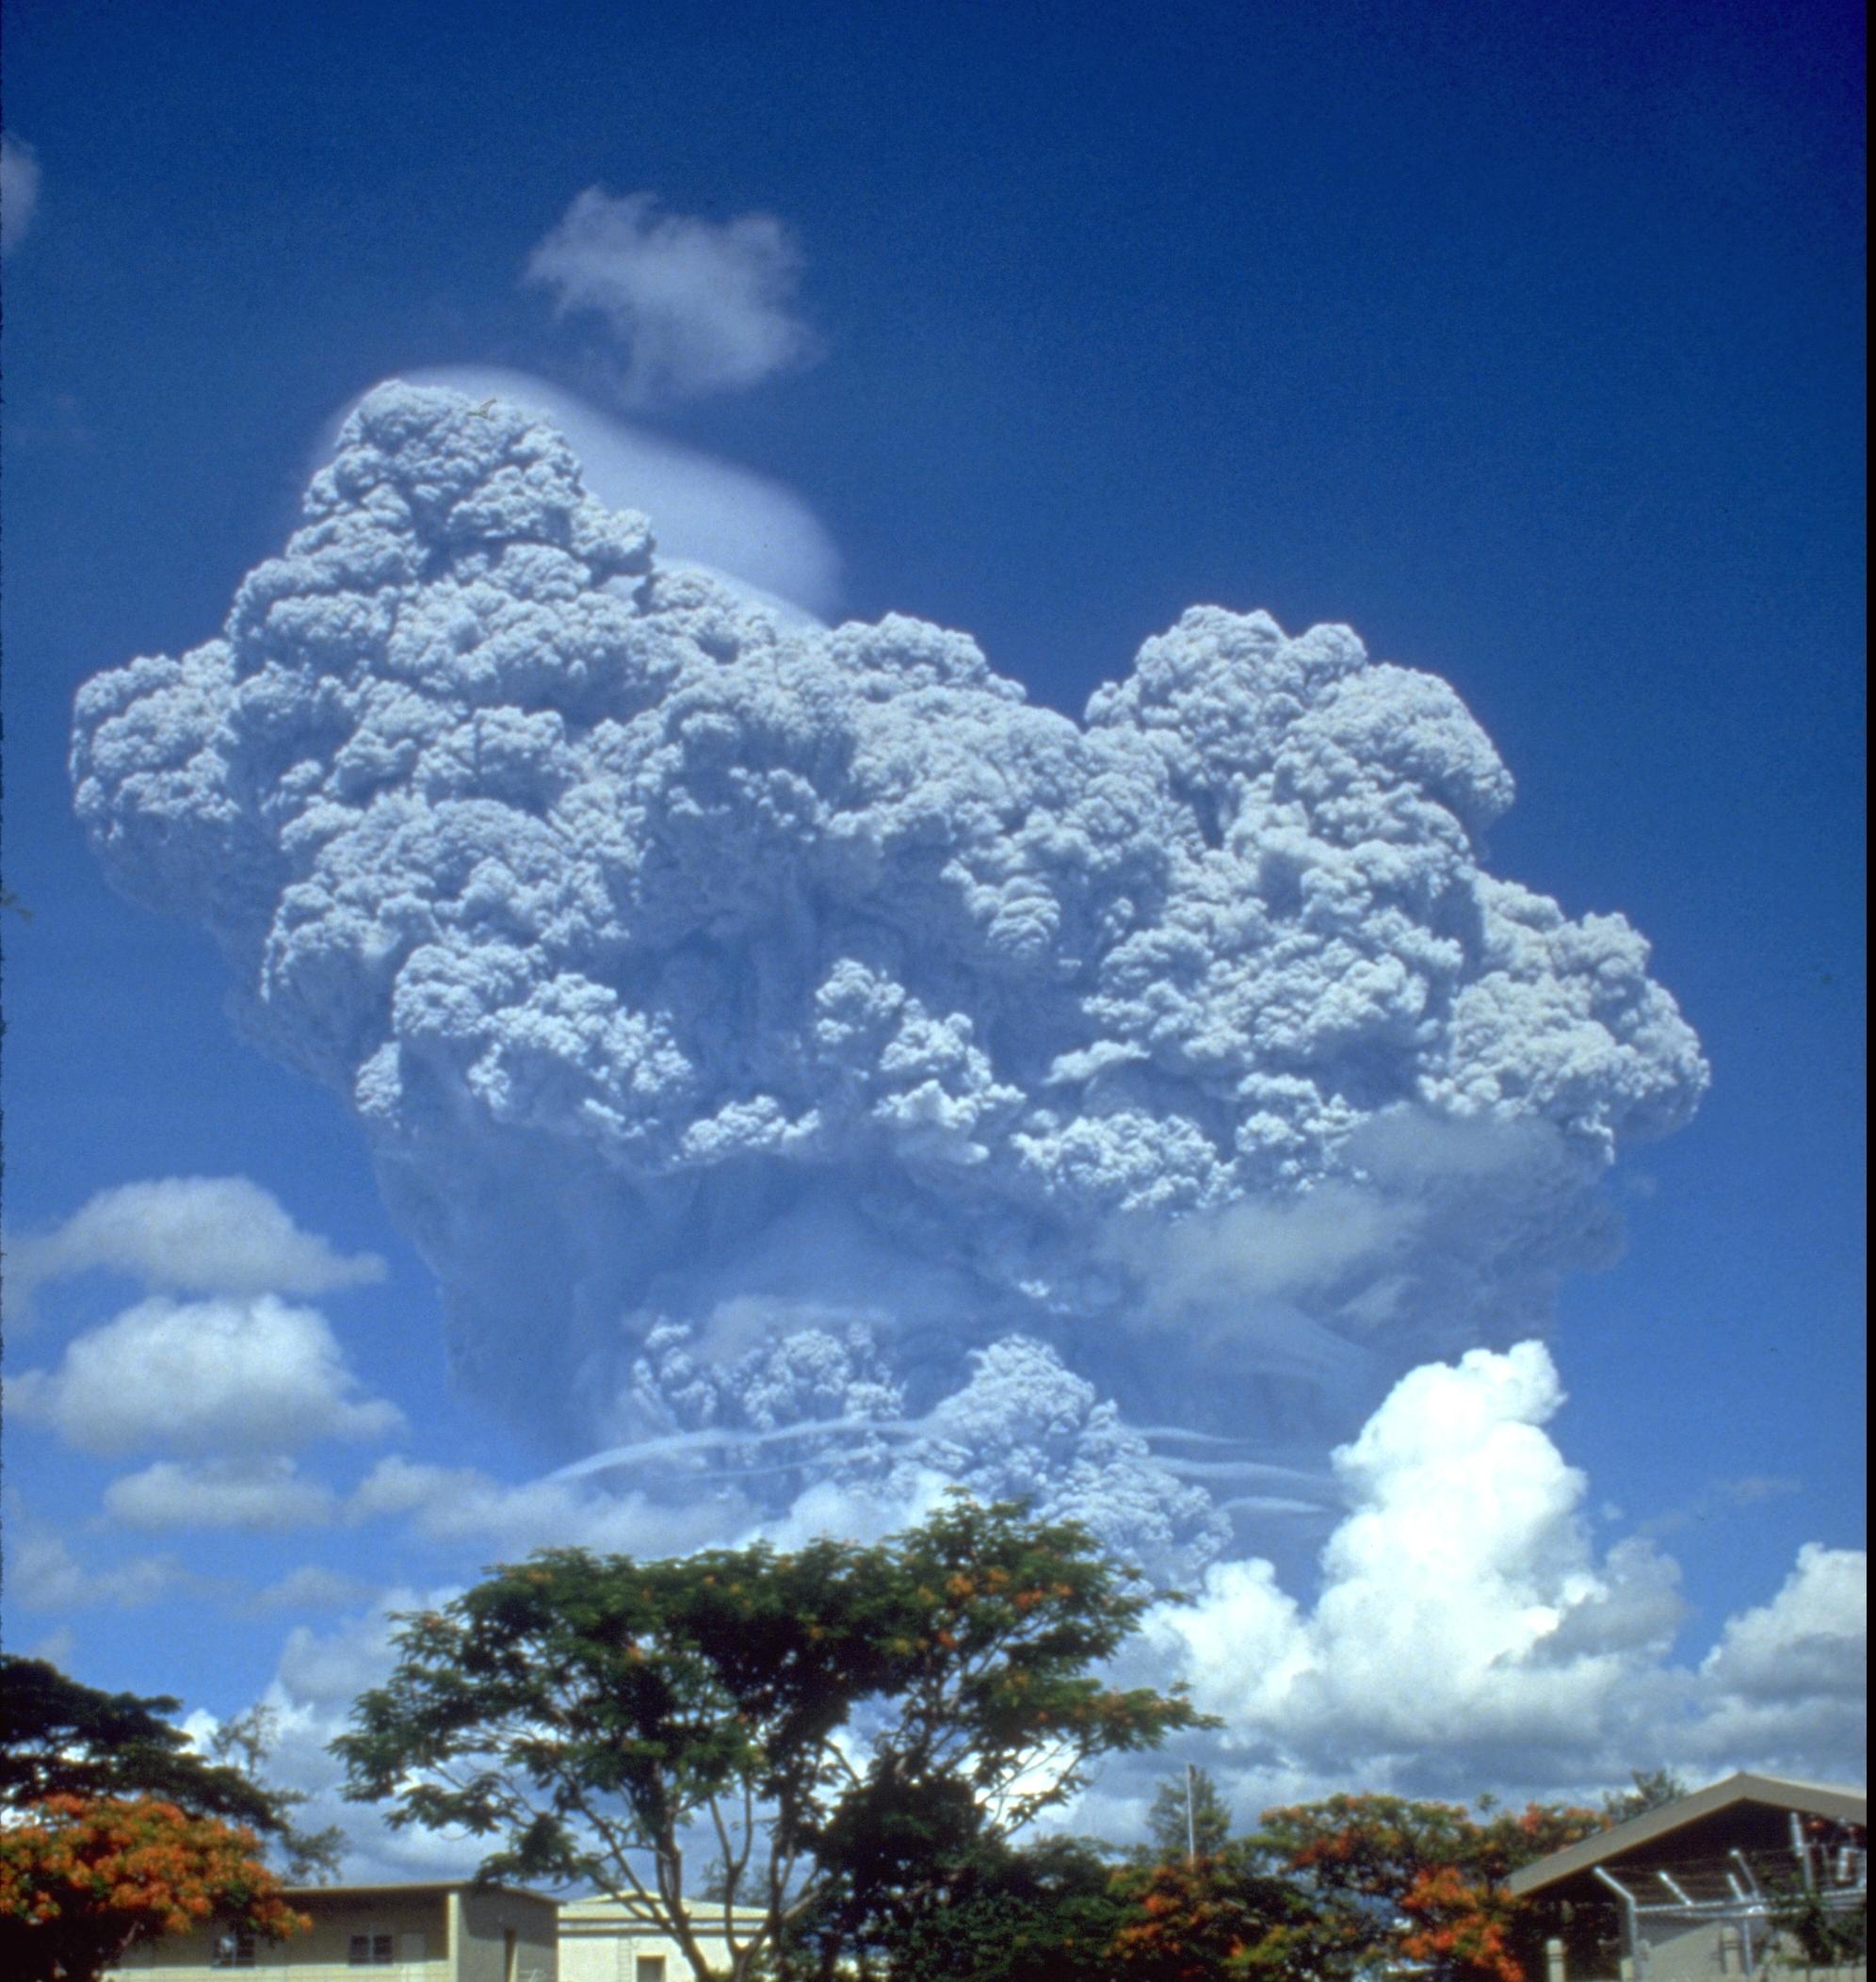 f11b_280px-Pinatubo91eruption_clark_air_base.jpeg